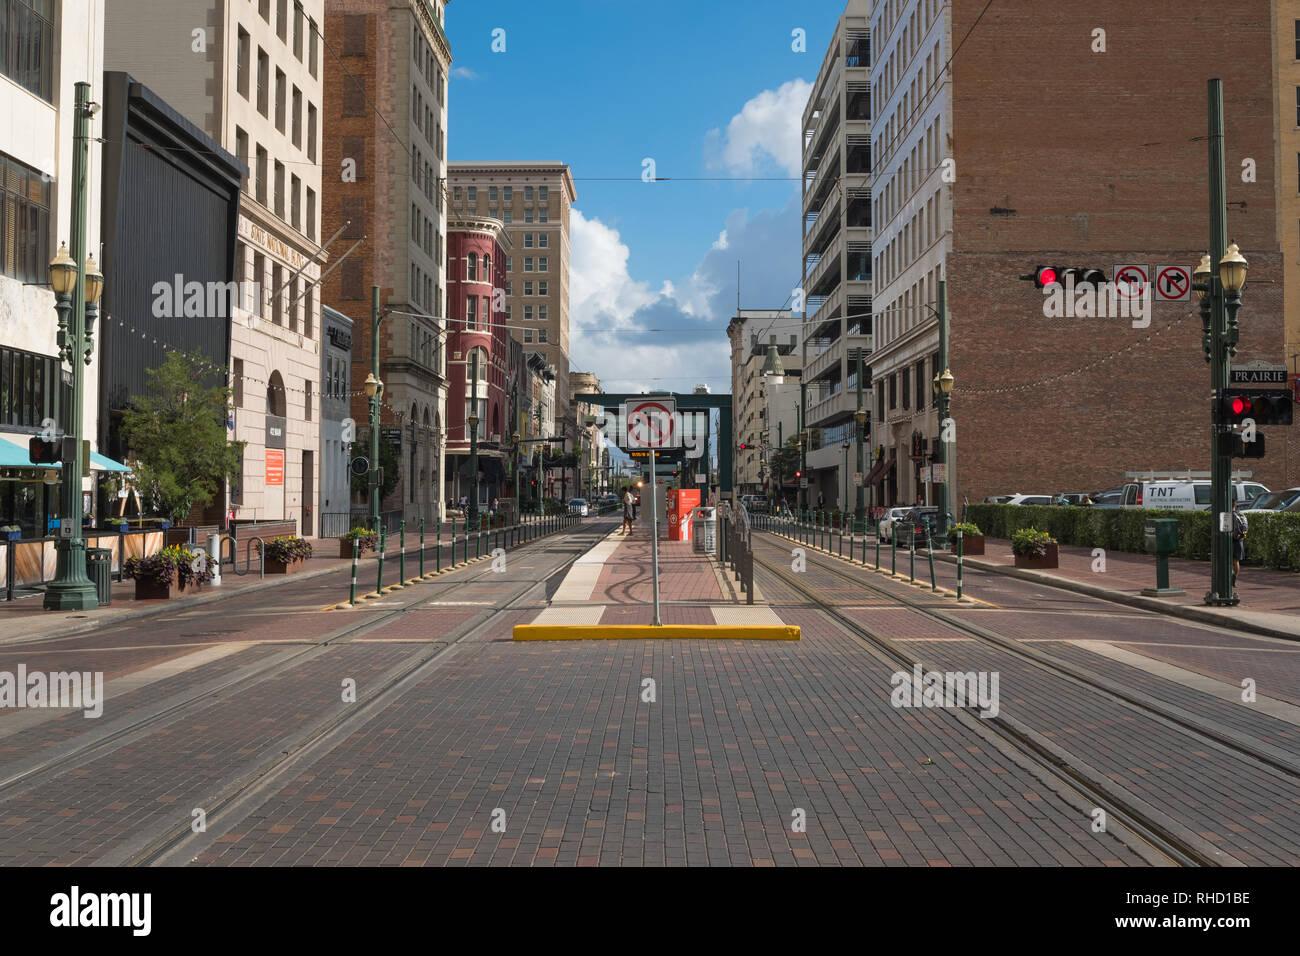 Preston Station, Main Street, Houston, Texas - Stock Image